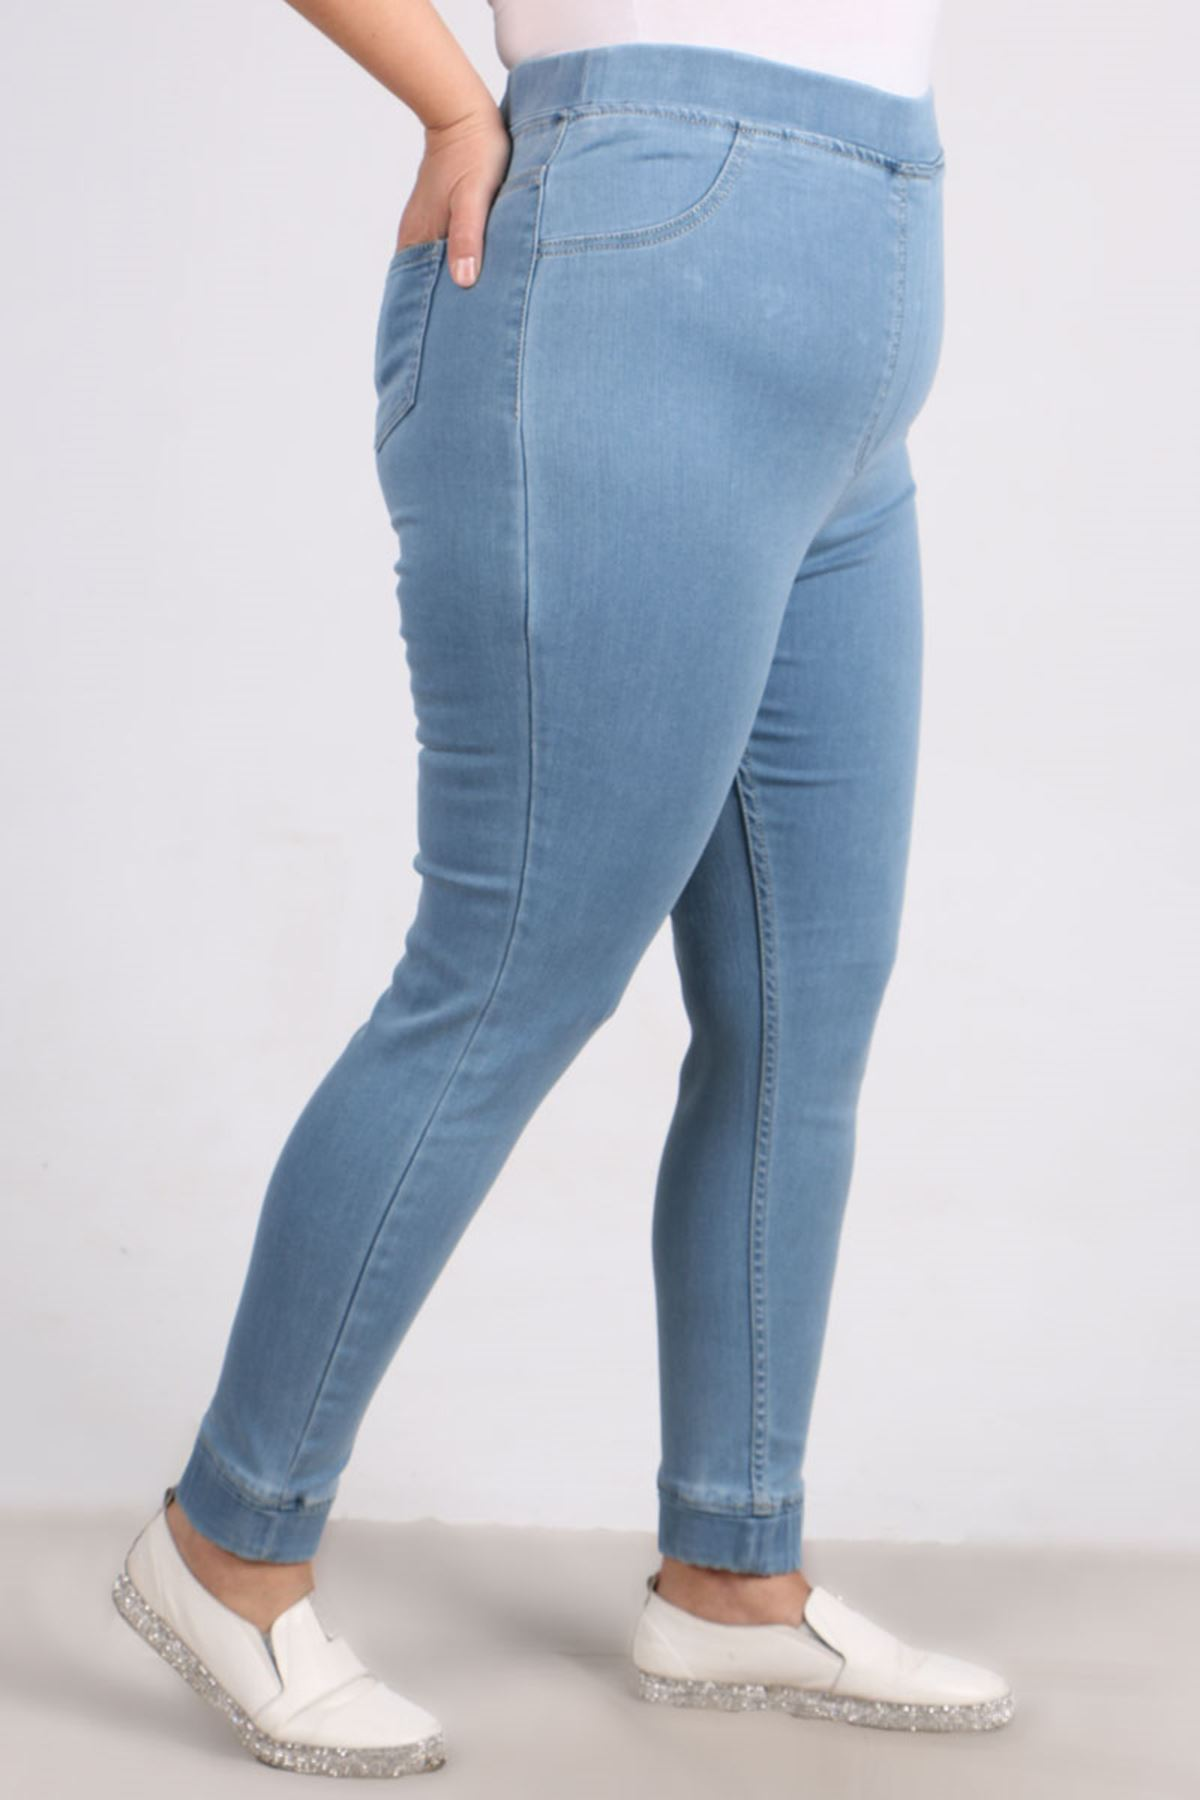 9139 Büyük Beden Beli Lastikli Dar Paça Kot Pantalon-Buz Mavi